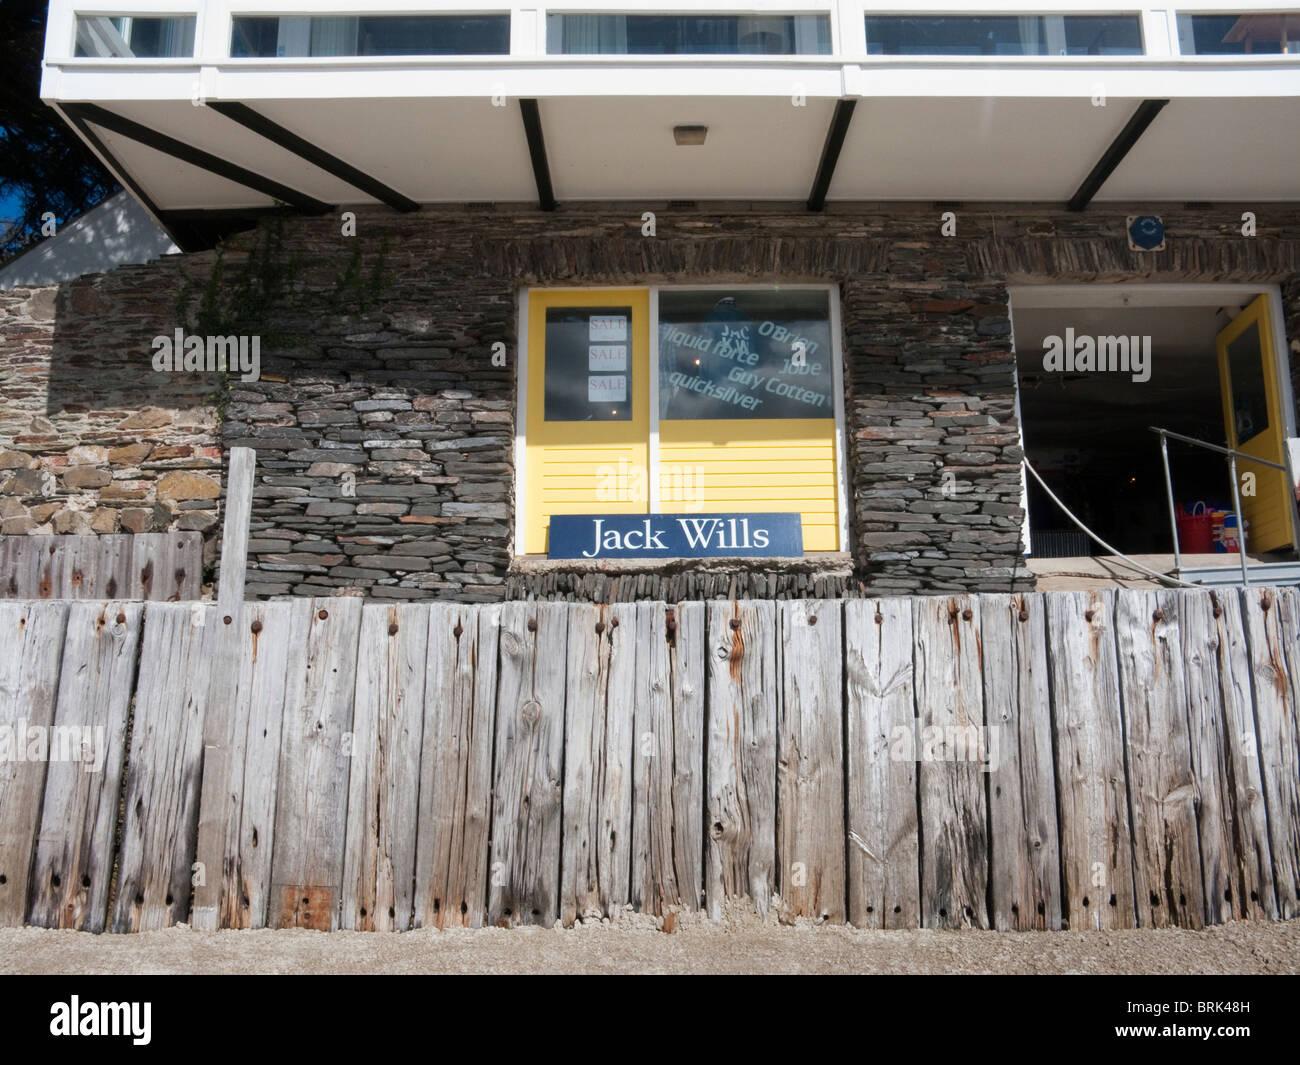 Temporary Jack Wills shop in Rock, Cornwall, UK - Stock Image